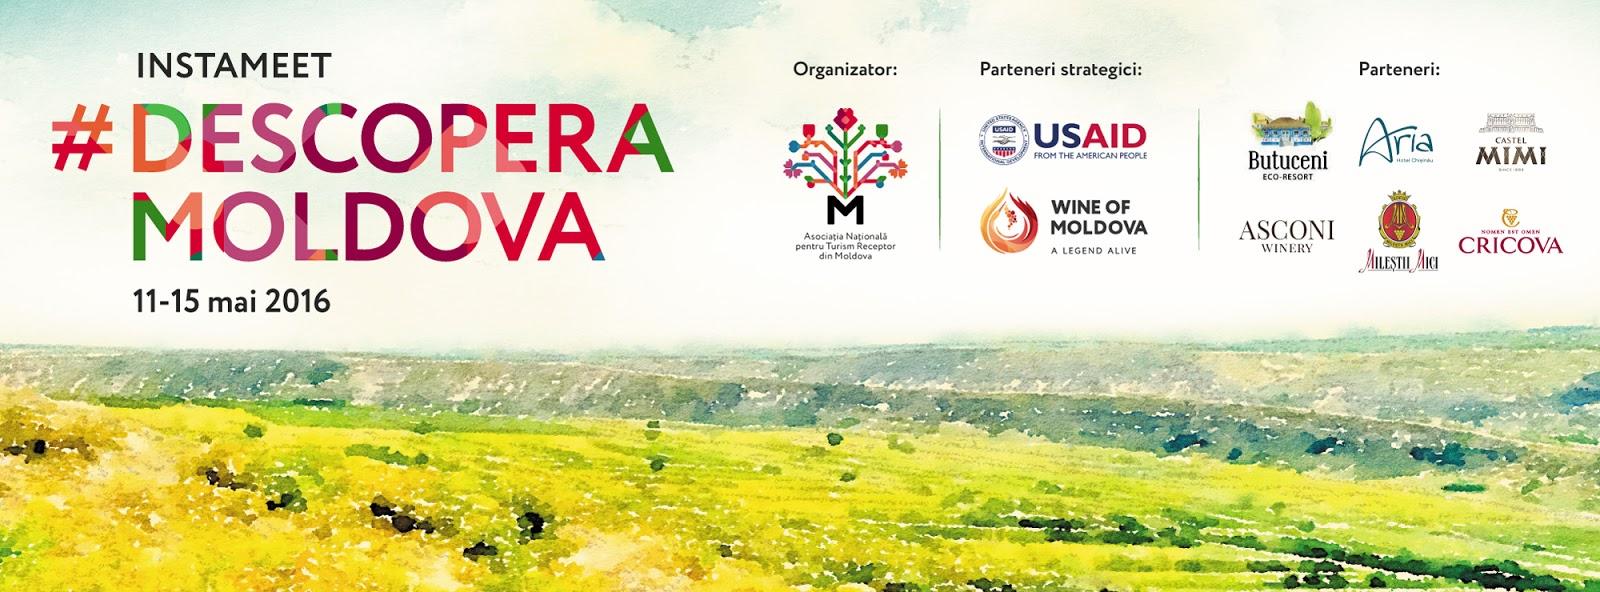 Instameet-Descopera-Moldova-FB-cover-1.jpg